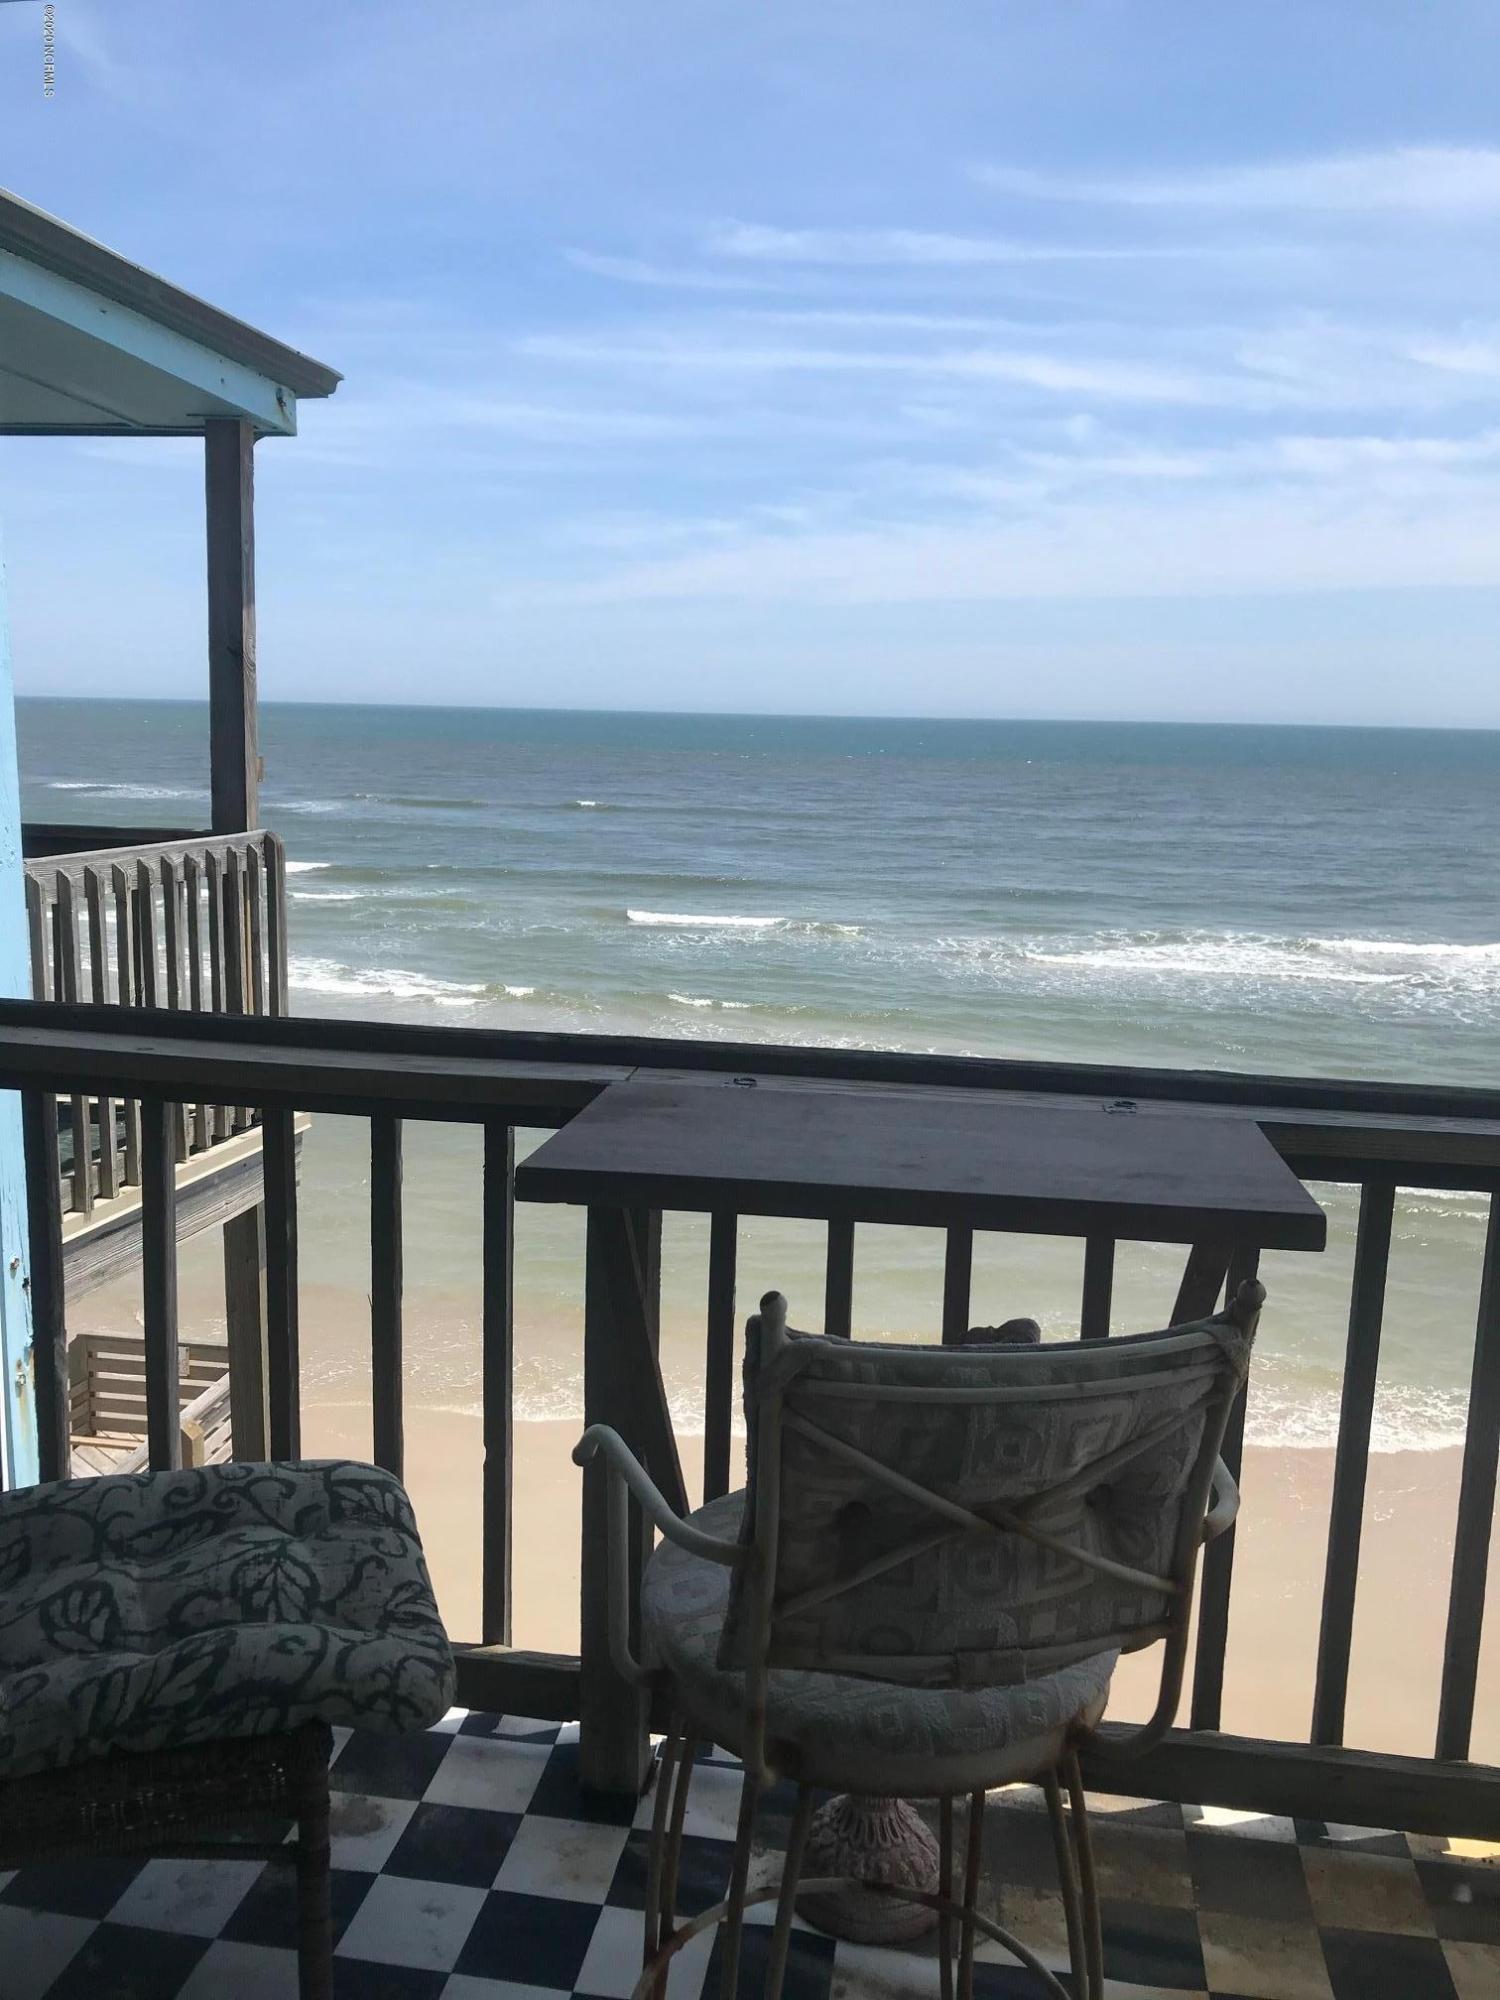 2264 New River Inlet Road, North Topsail Beach, North Carolina 28460, 1 Bedroom Bedrooms, 3 Rooms Rooms,1 BathroomBathrooms,Condominium,For sale,New River Inlet,100219218